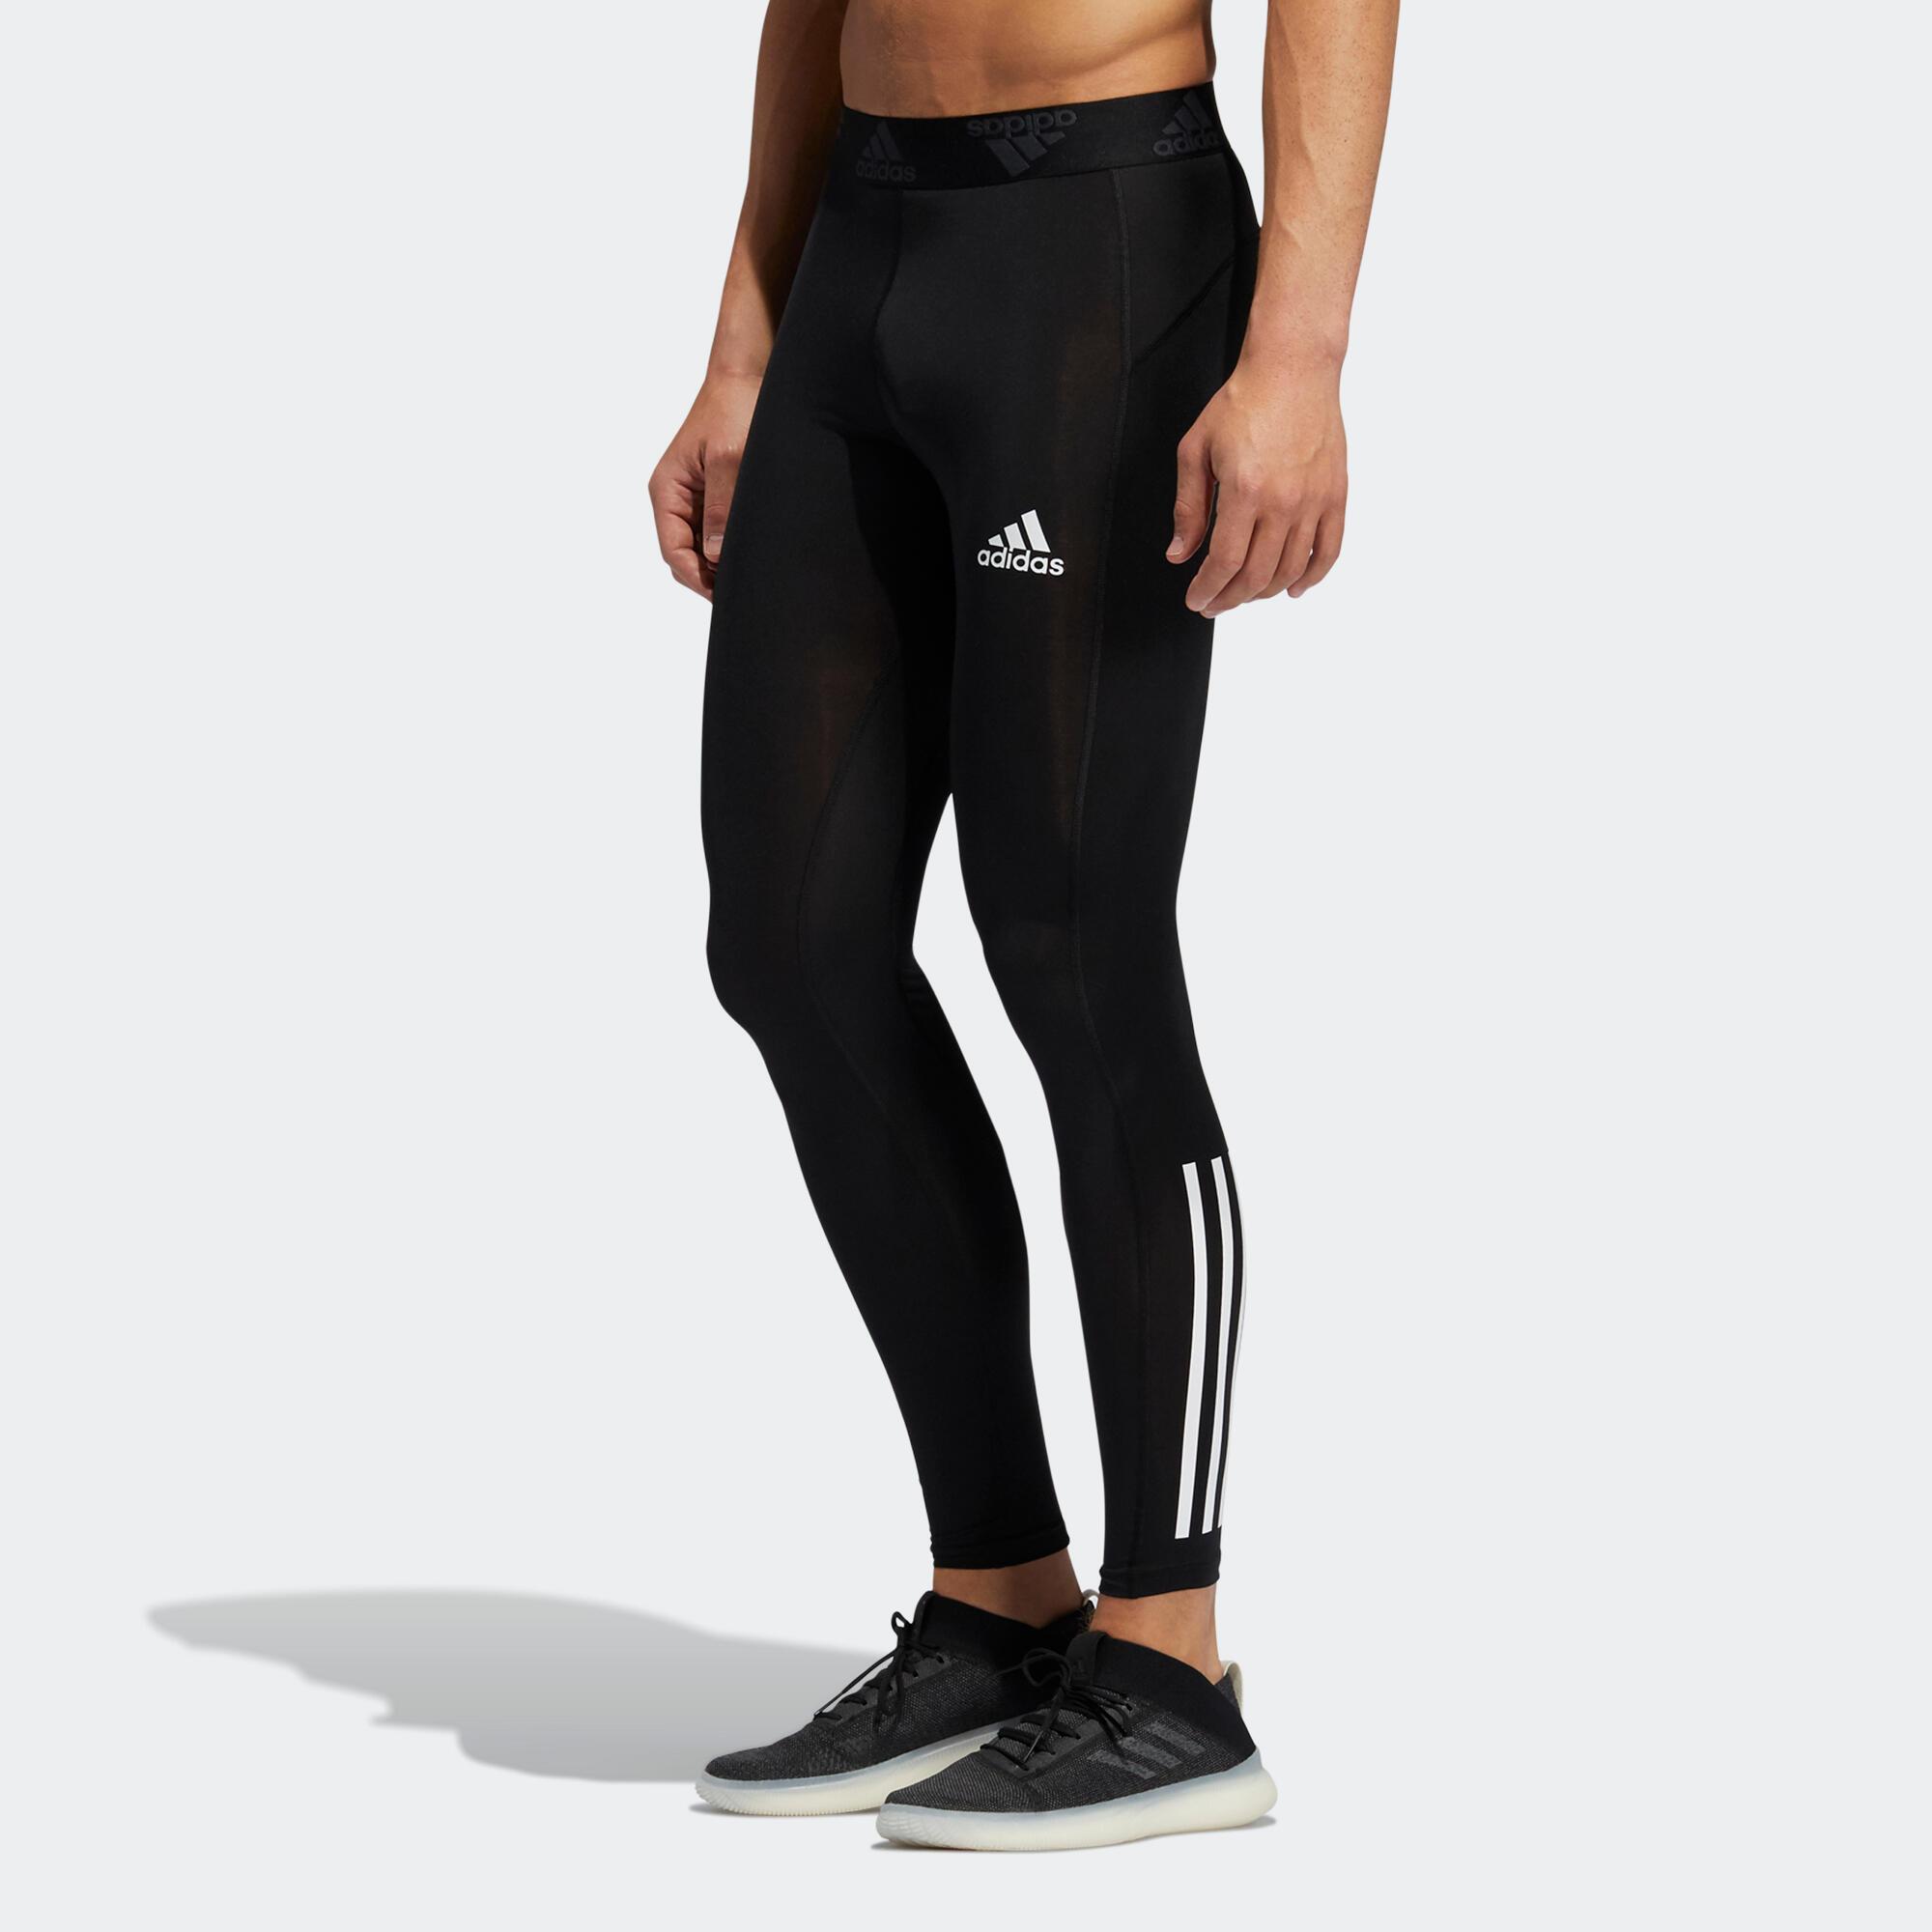 Colanţi Fitness Cardio Adidas imagine